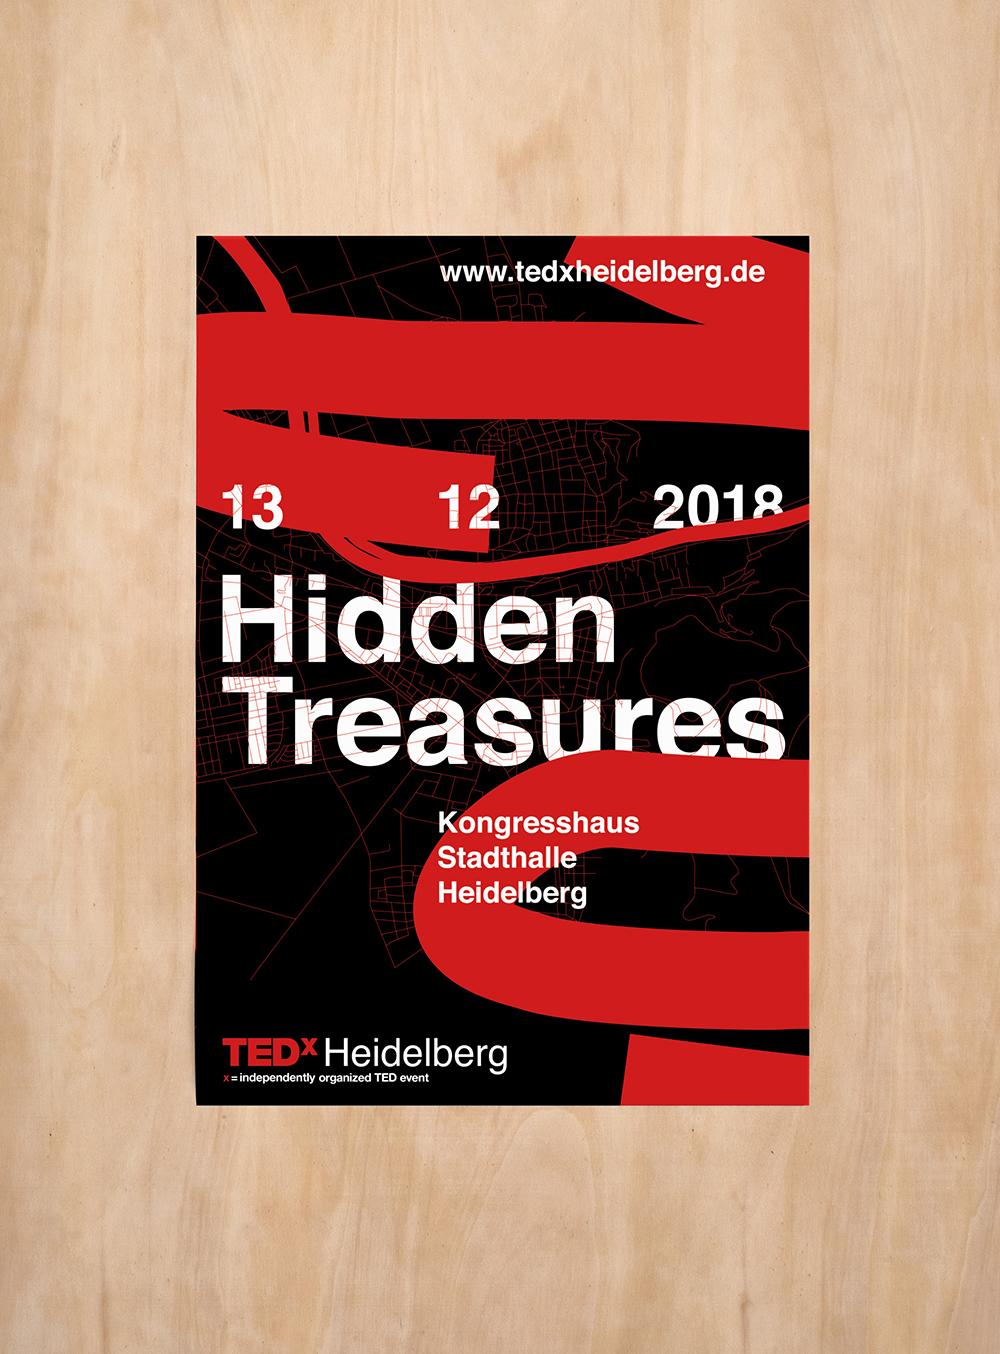 Alexandra Bald TEDX Heidelberg